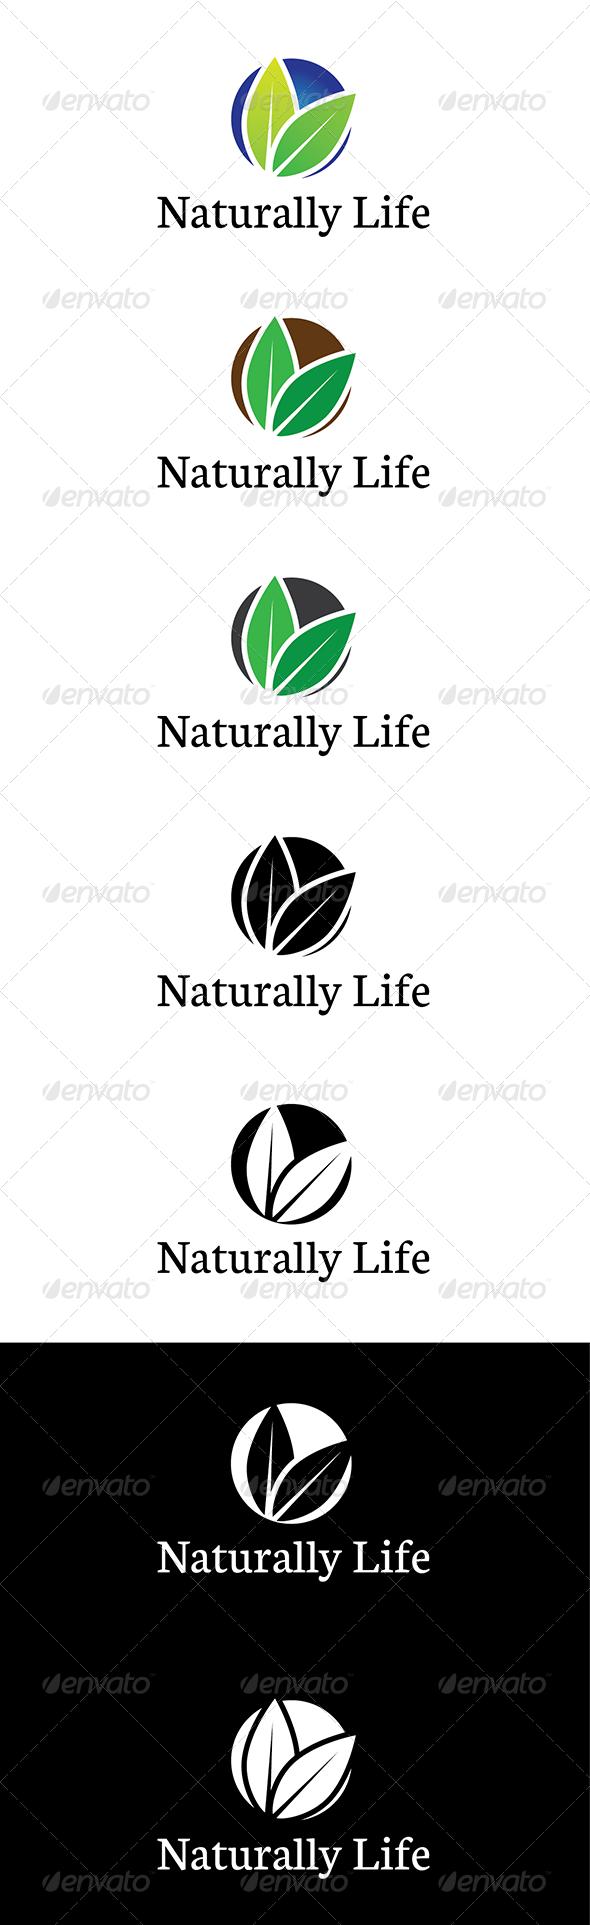 Naturally Life Logo